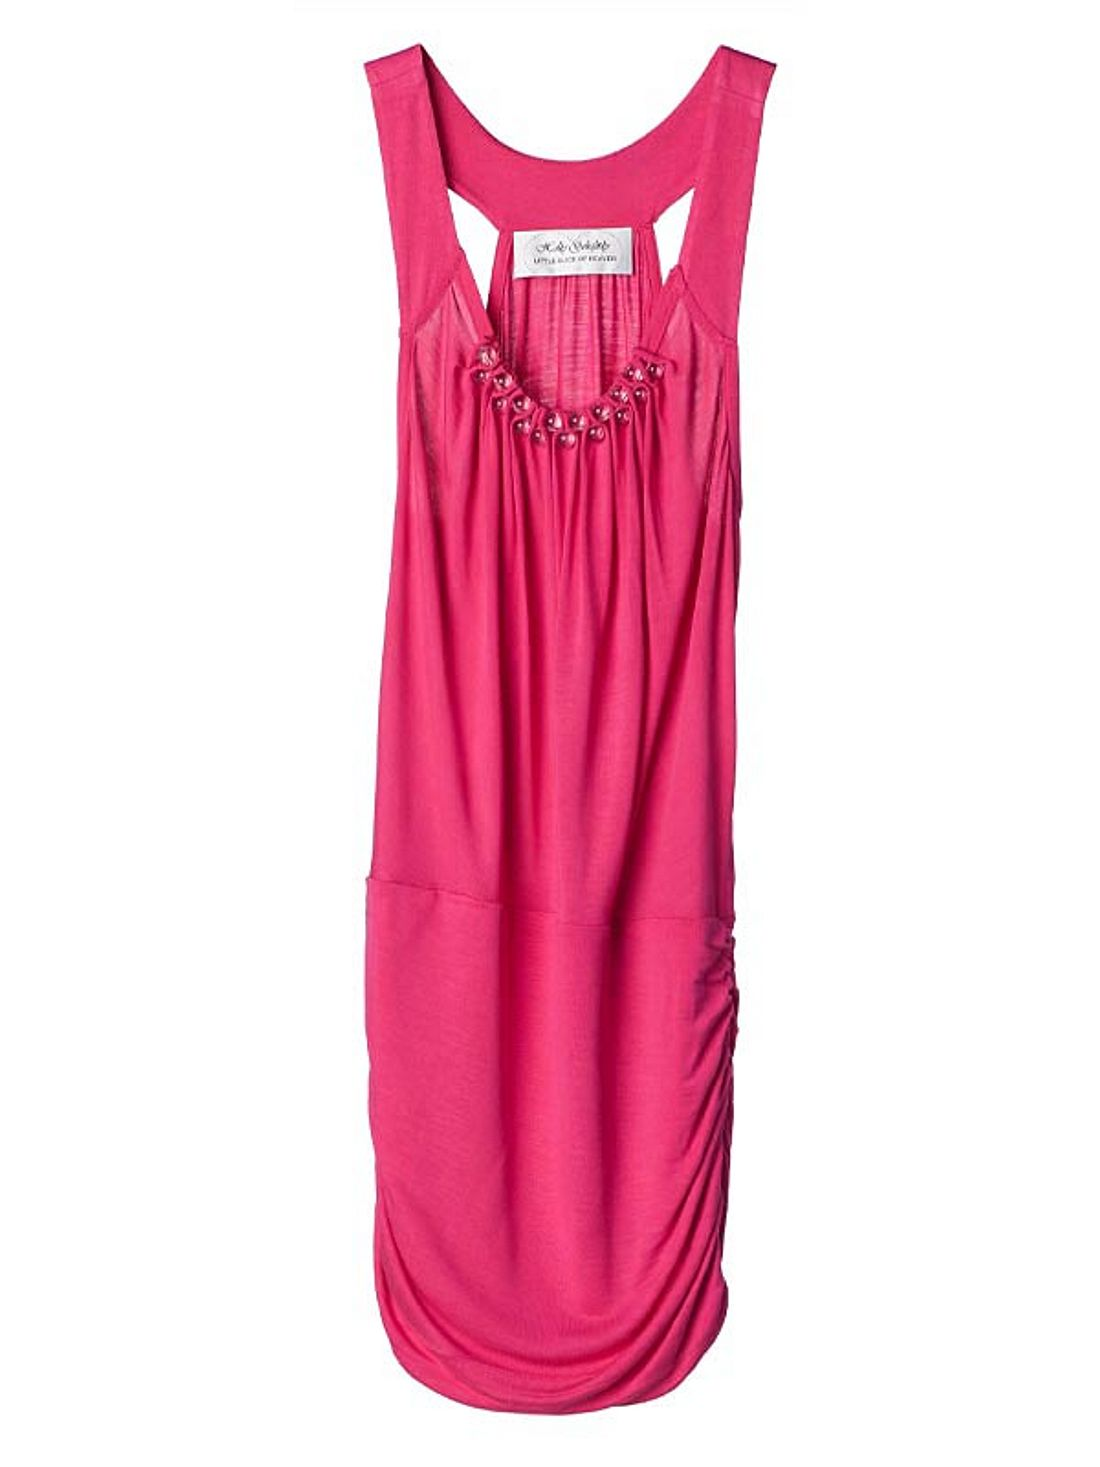 Pinke Kleider: Flamingo-Fashion